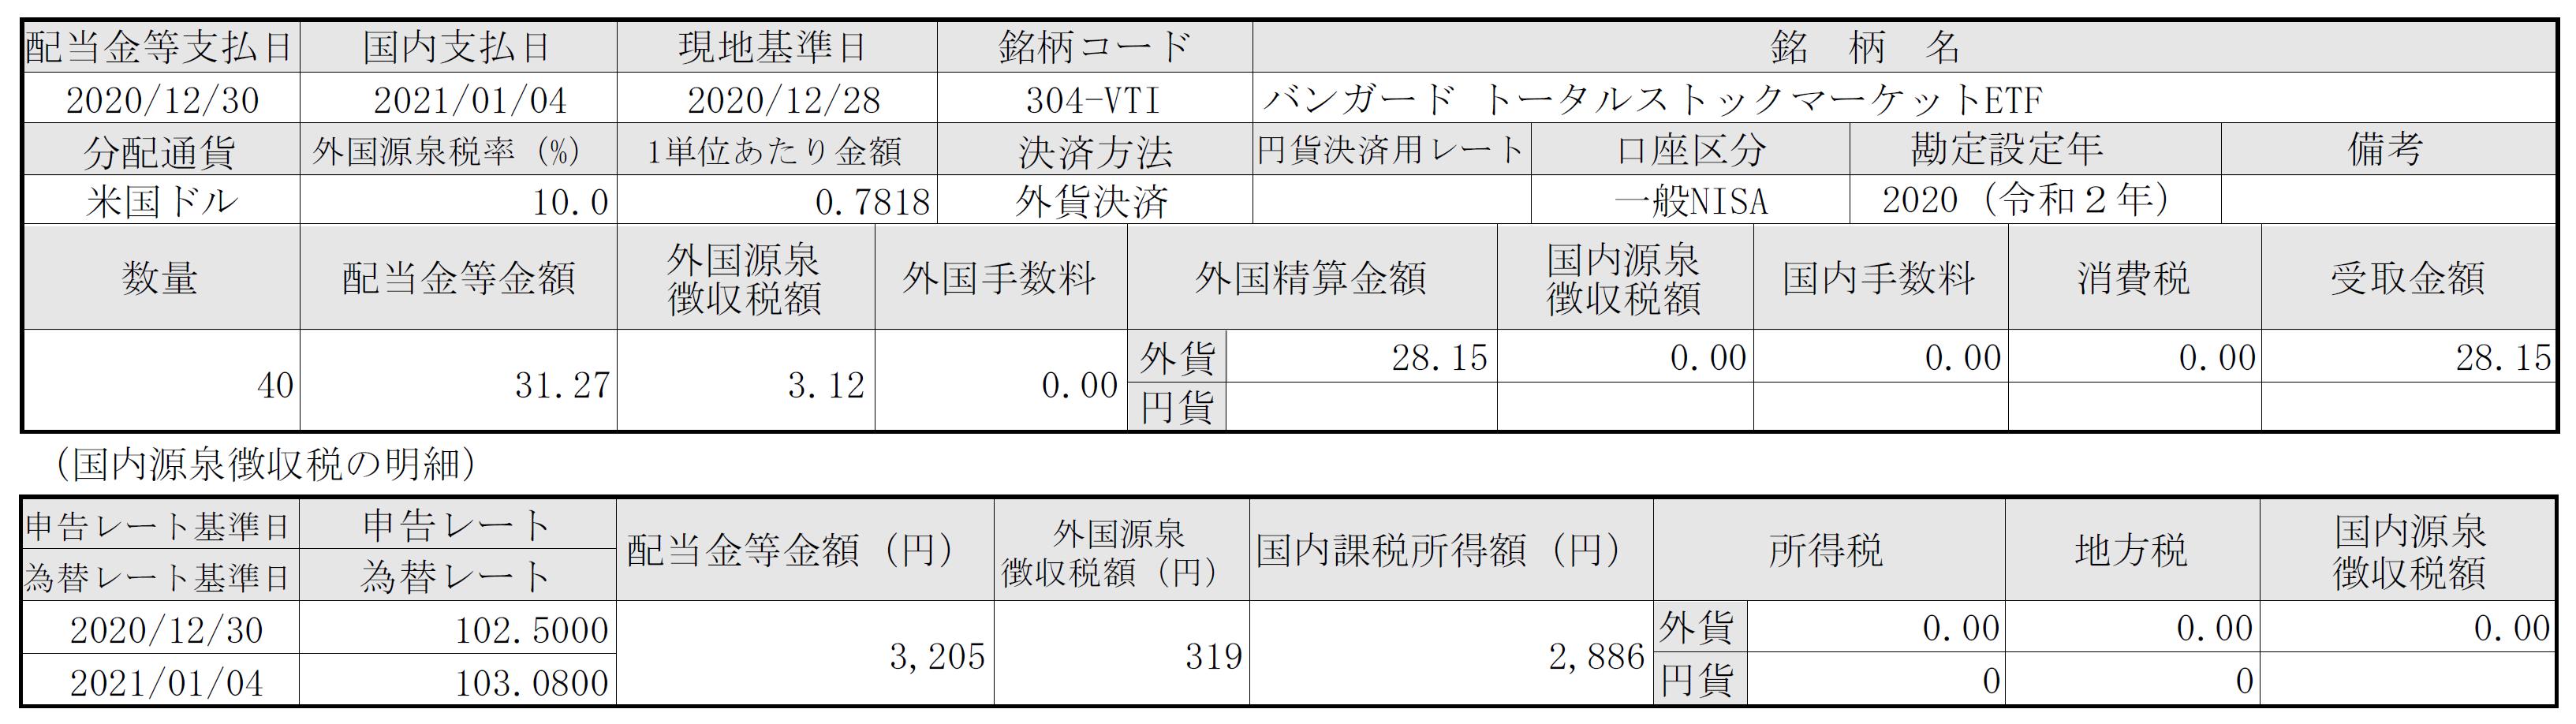 f:id:hodo-work:20210112111051p:plain